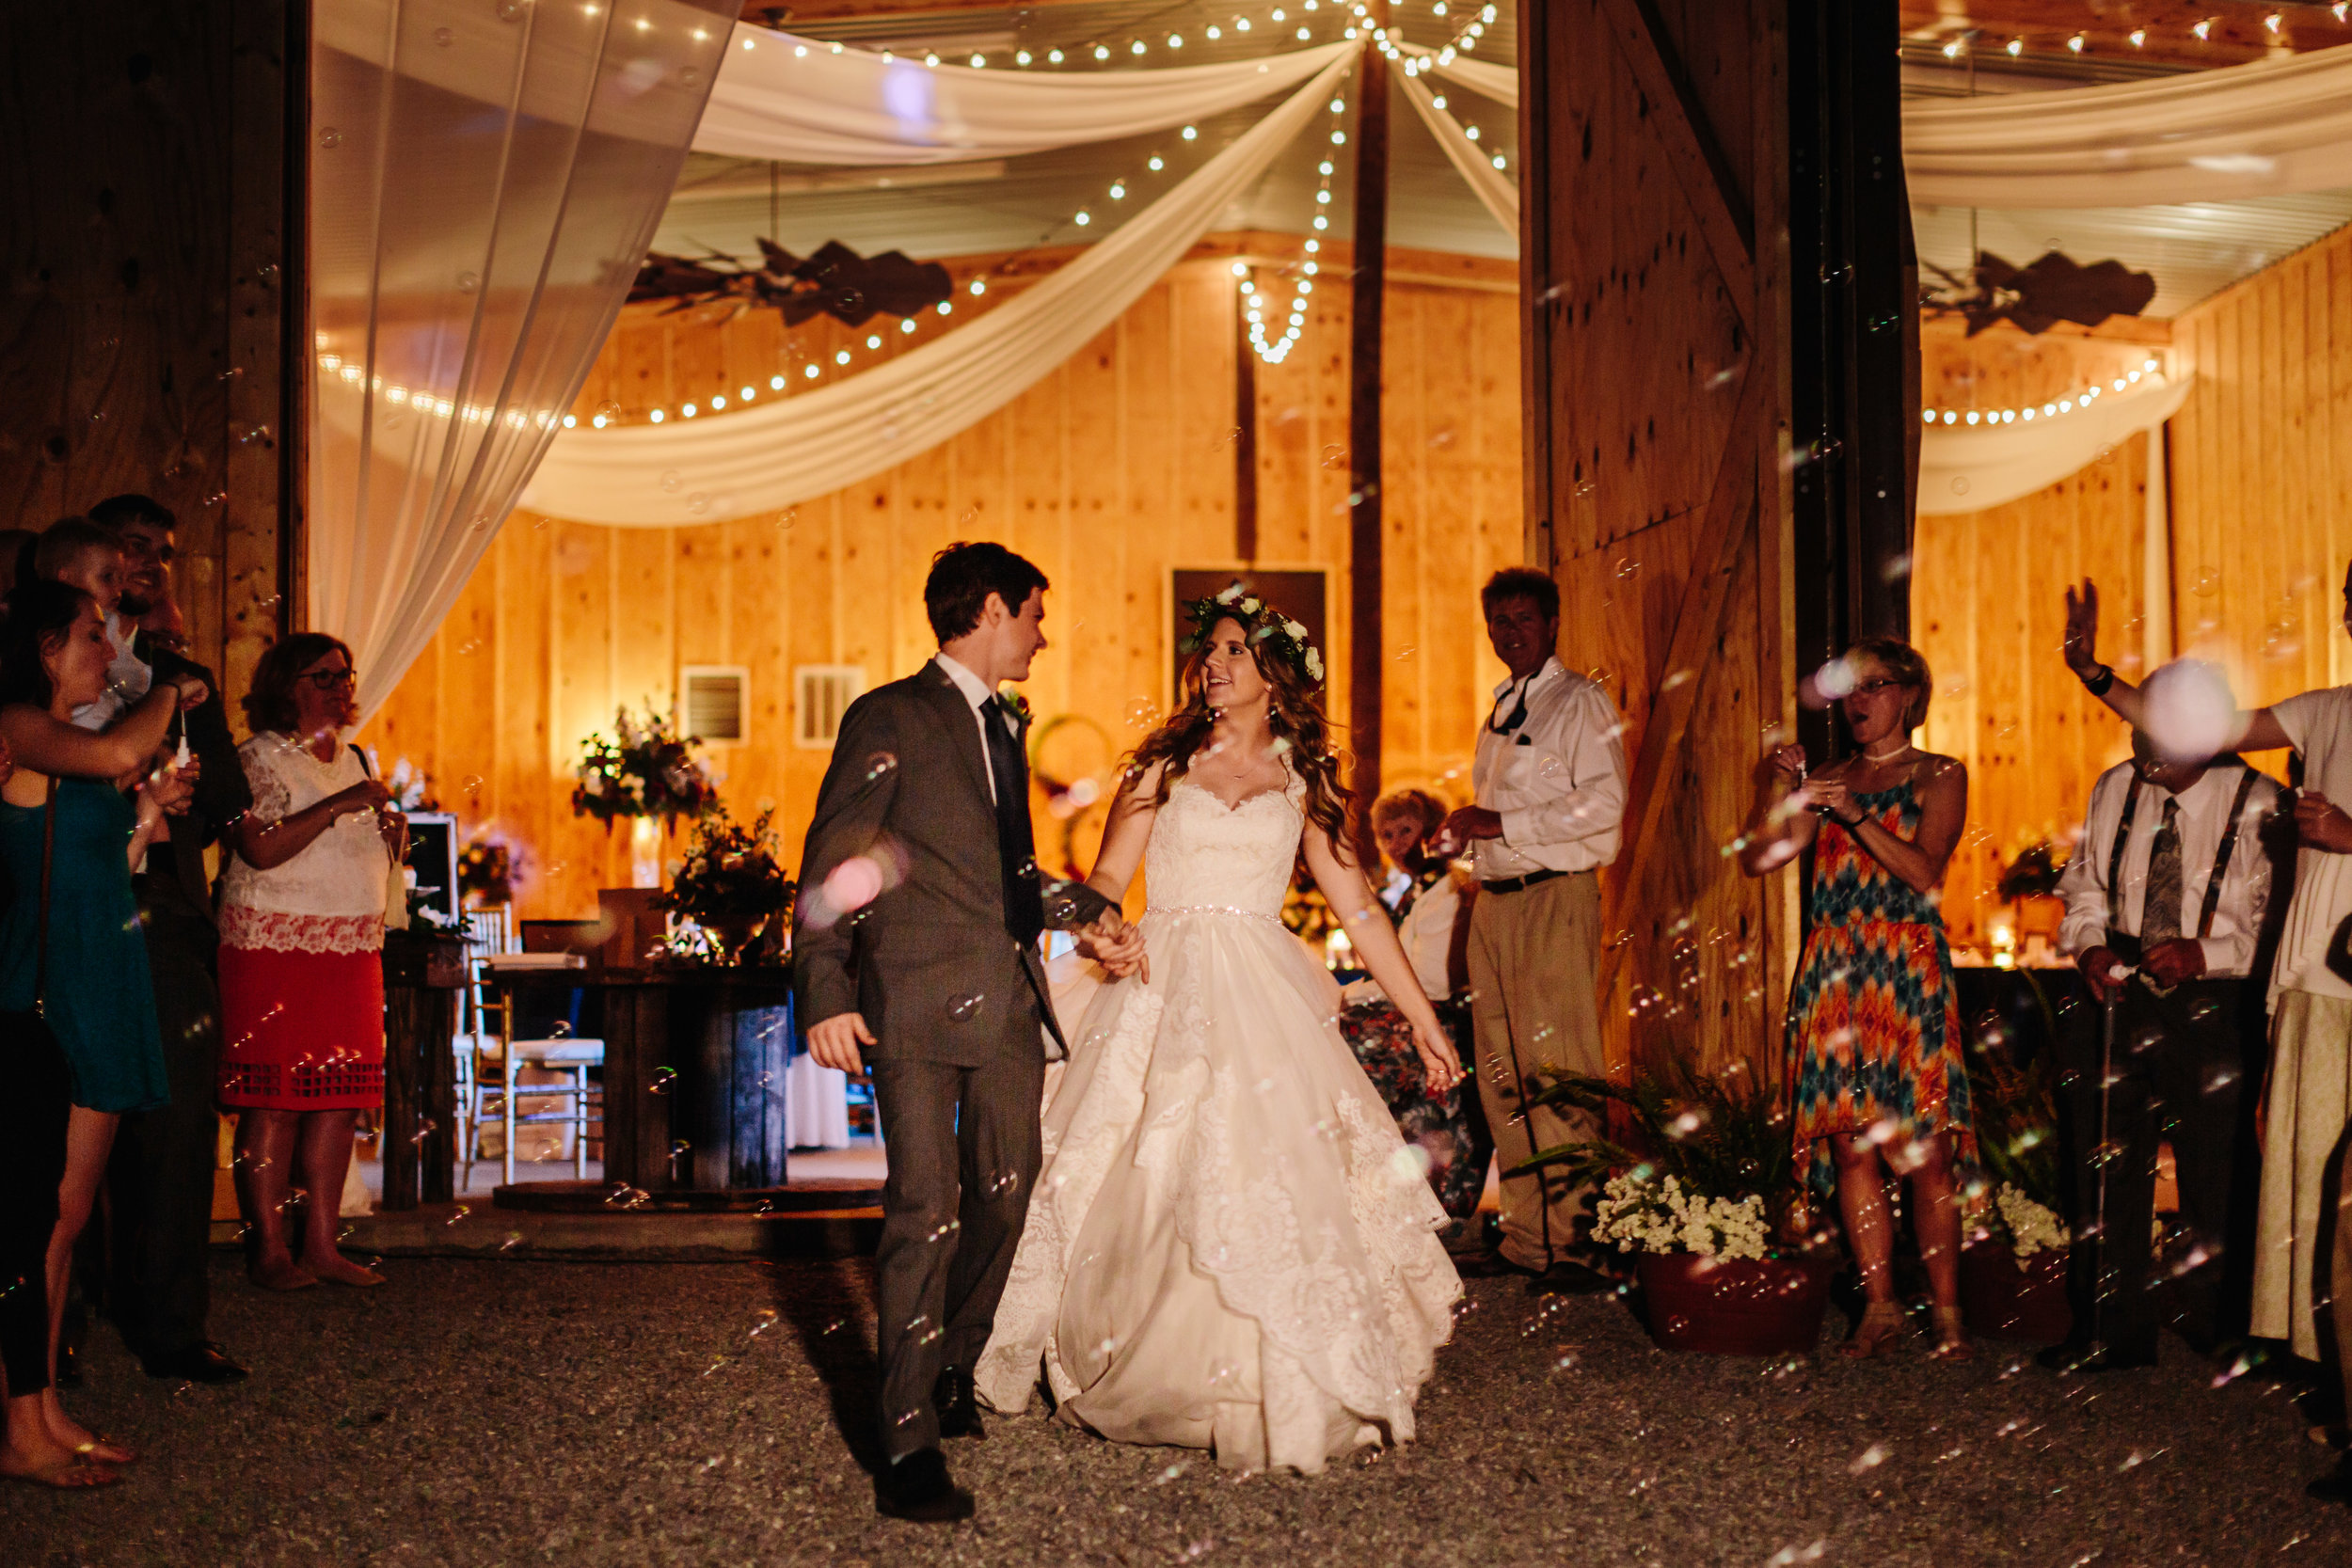 2018.04.14 Zak and Jamisyn Unrue Black Willow Barn Wedding Finals-853.jpg